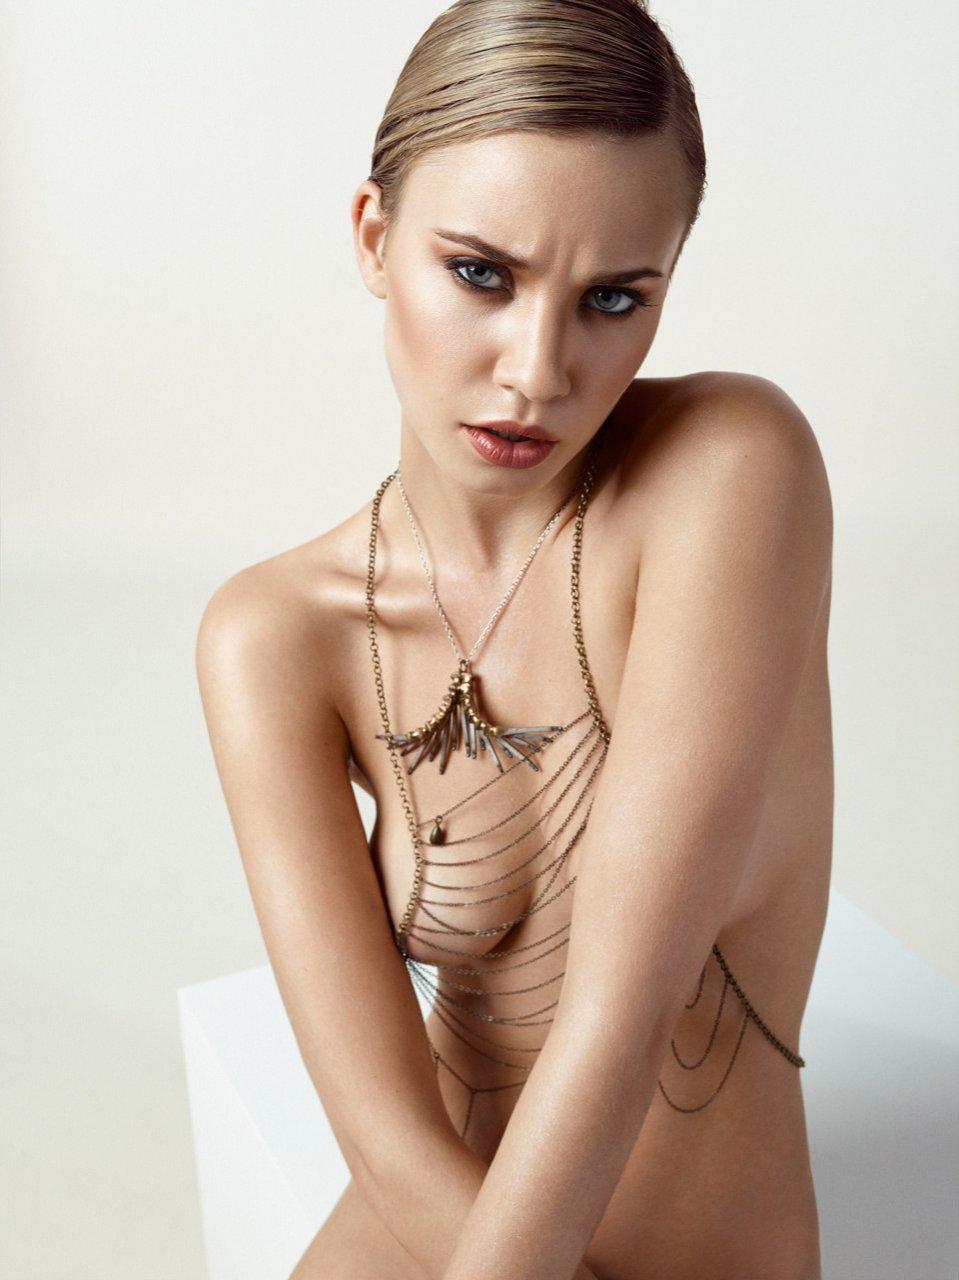 One beautiful model naked Jody the